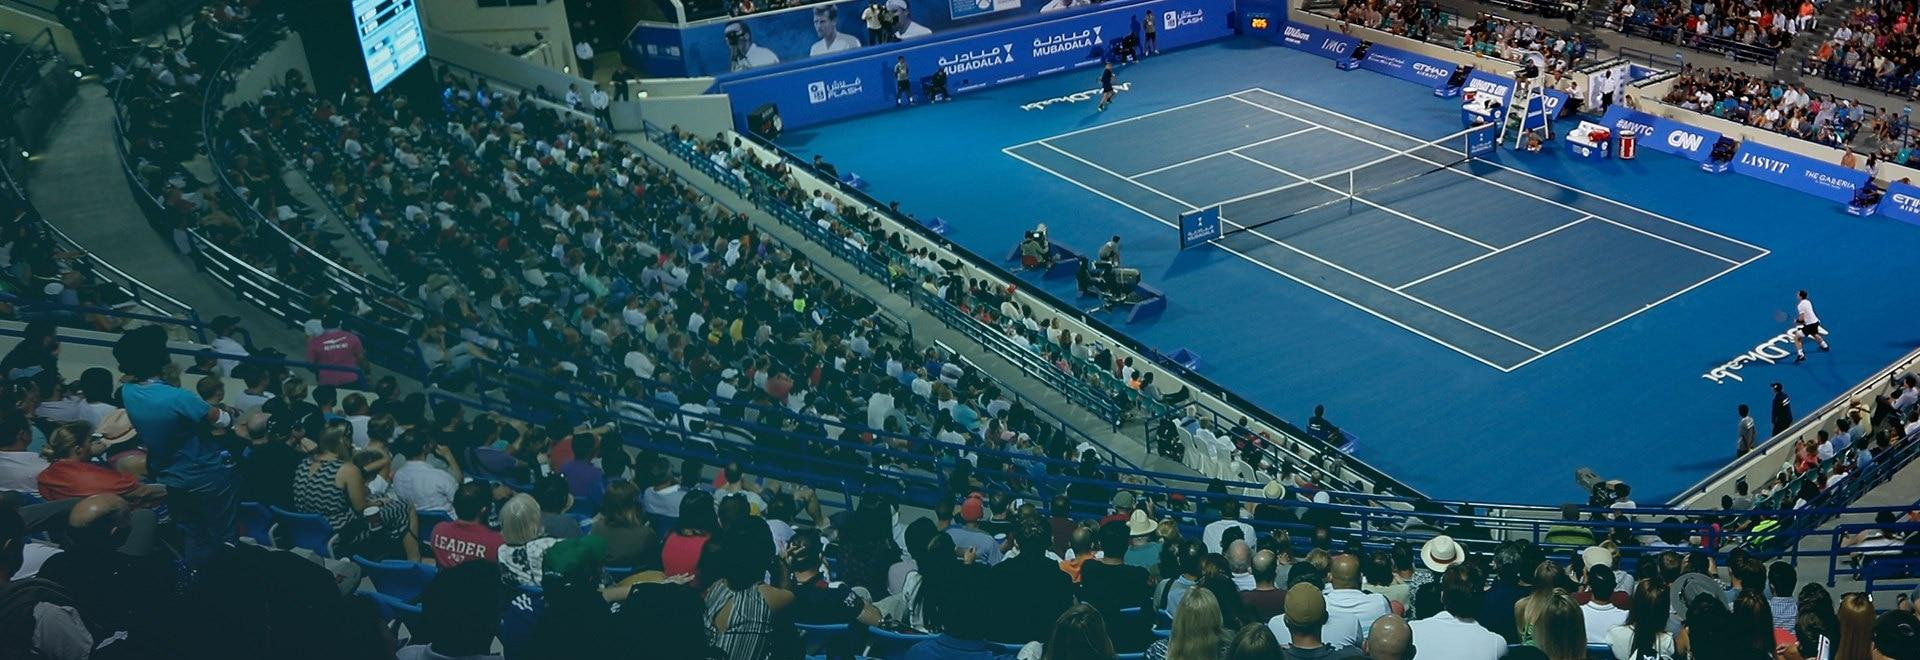 Nadal - Khachanov. 2a Semifinale M